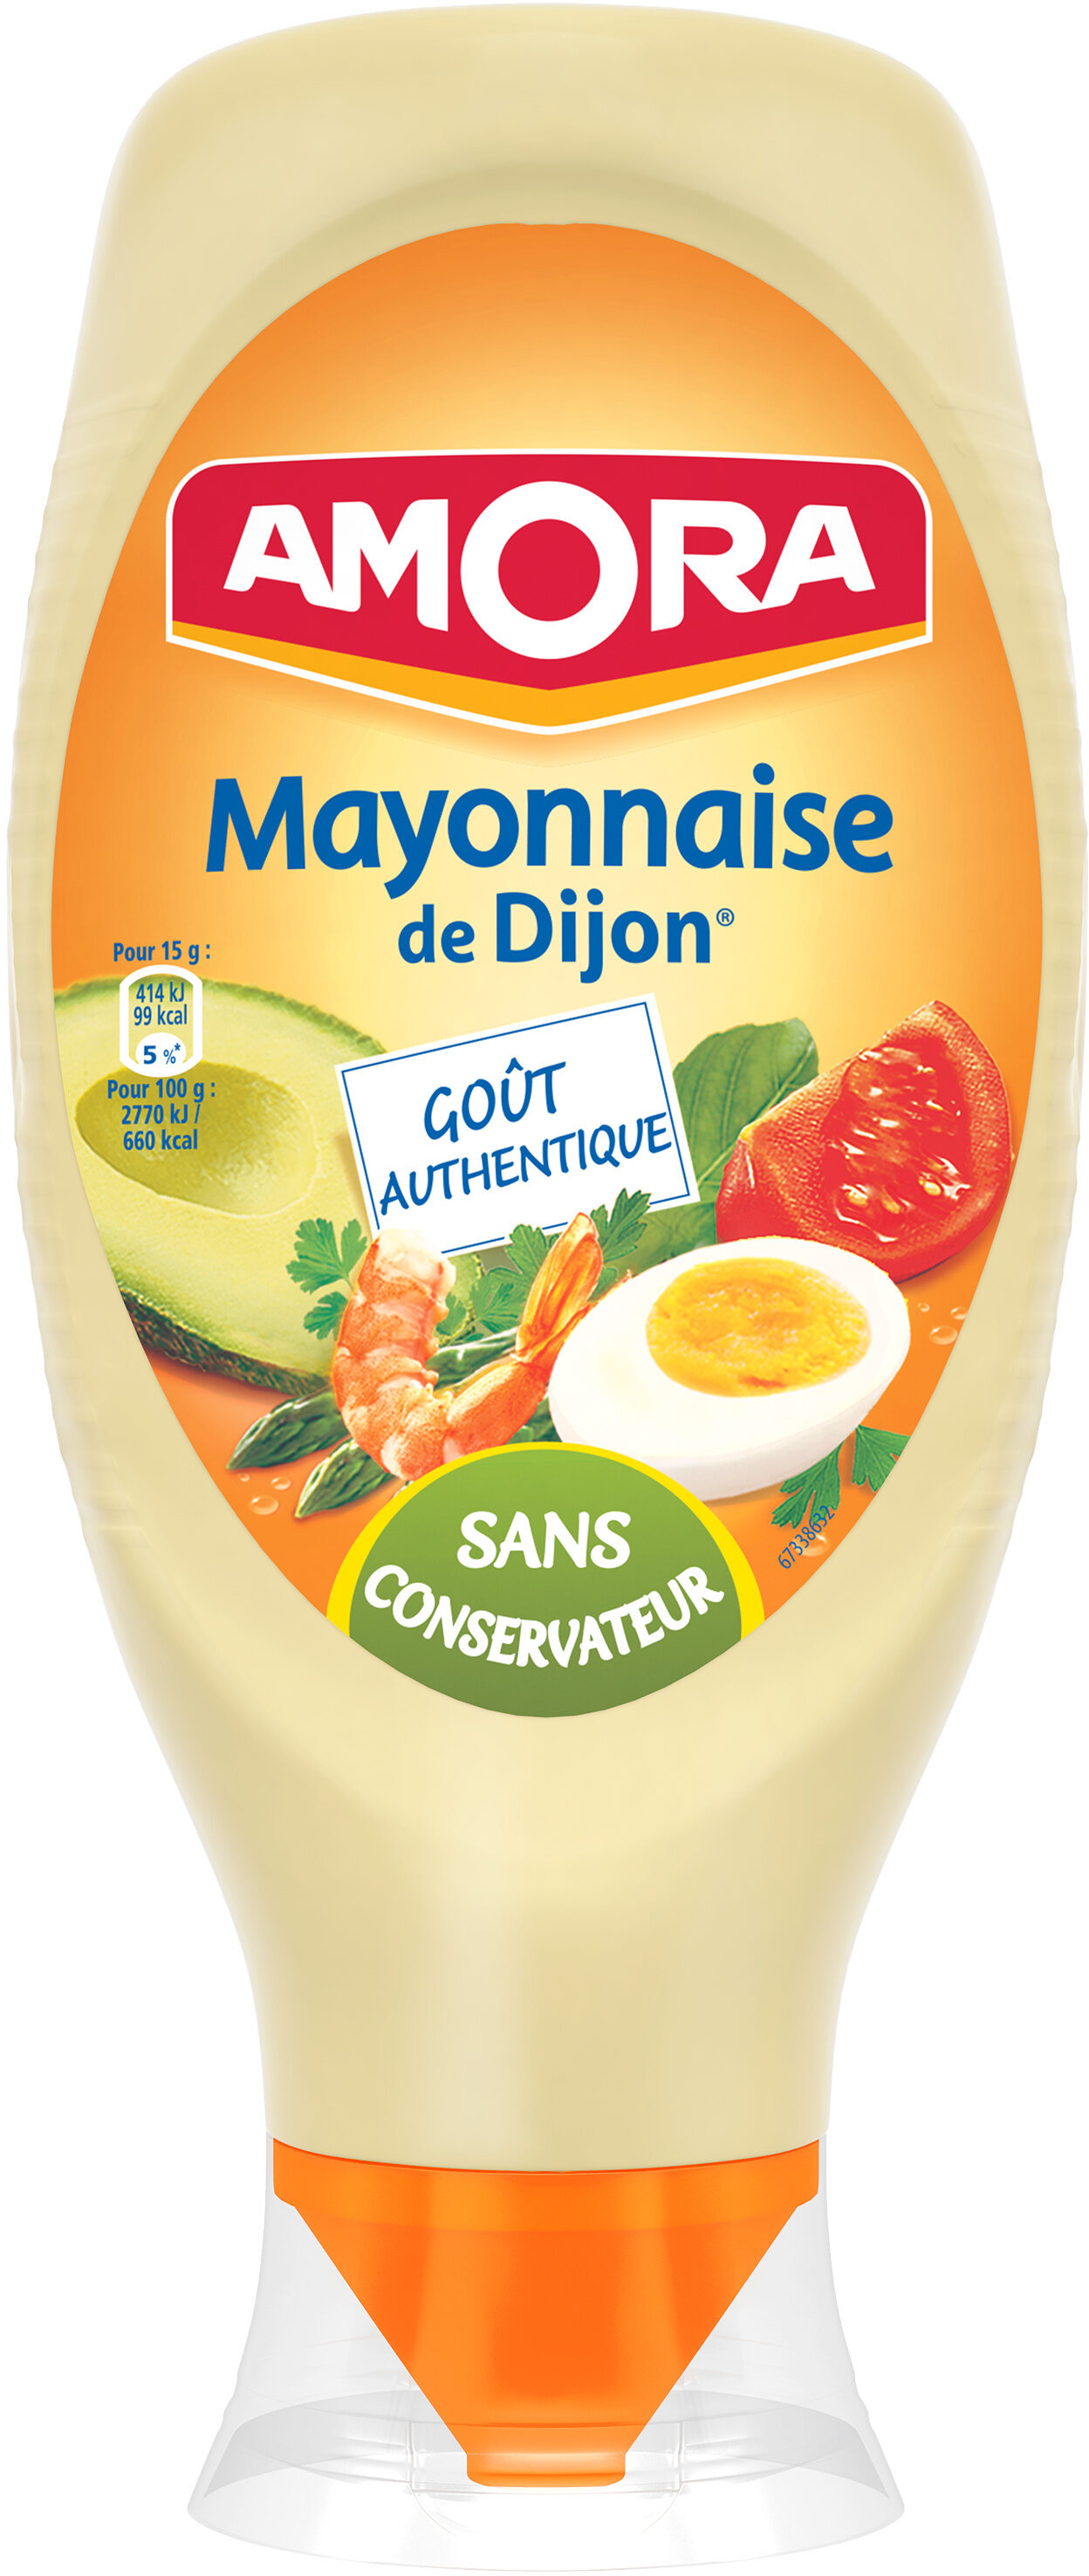 Amora mayo nat spl - Product - fr